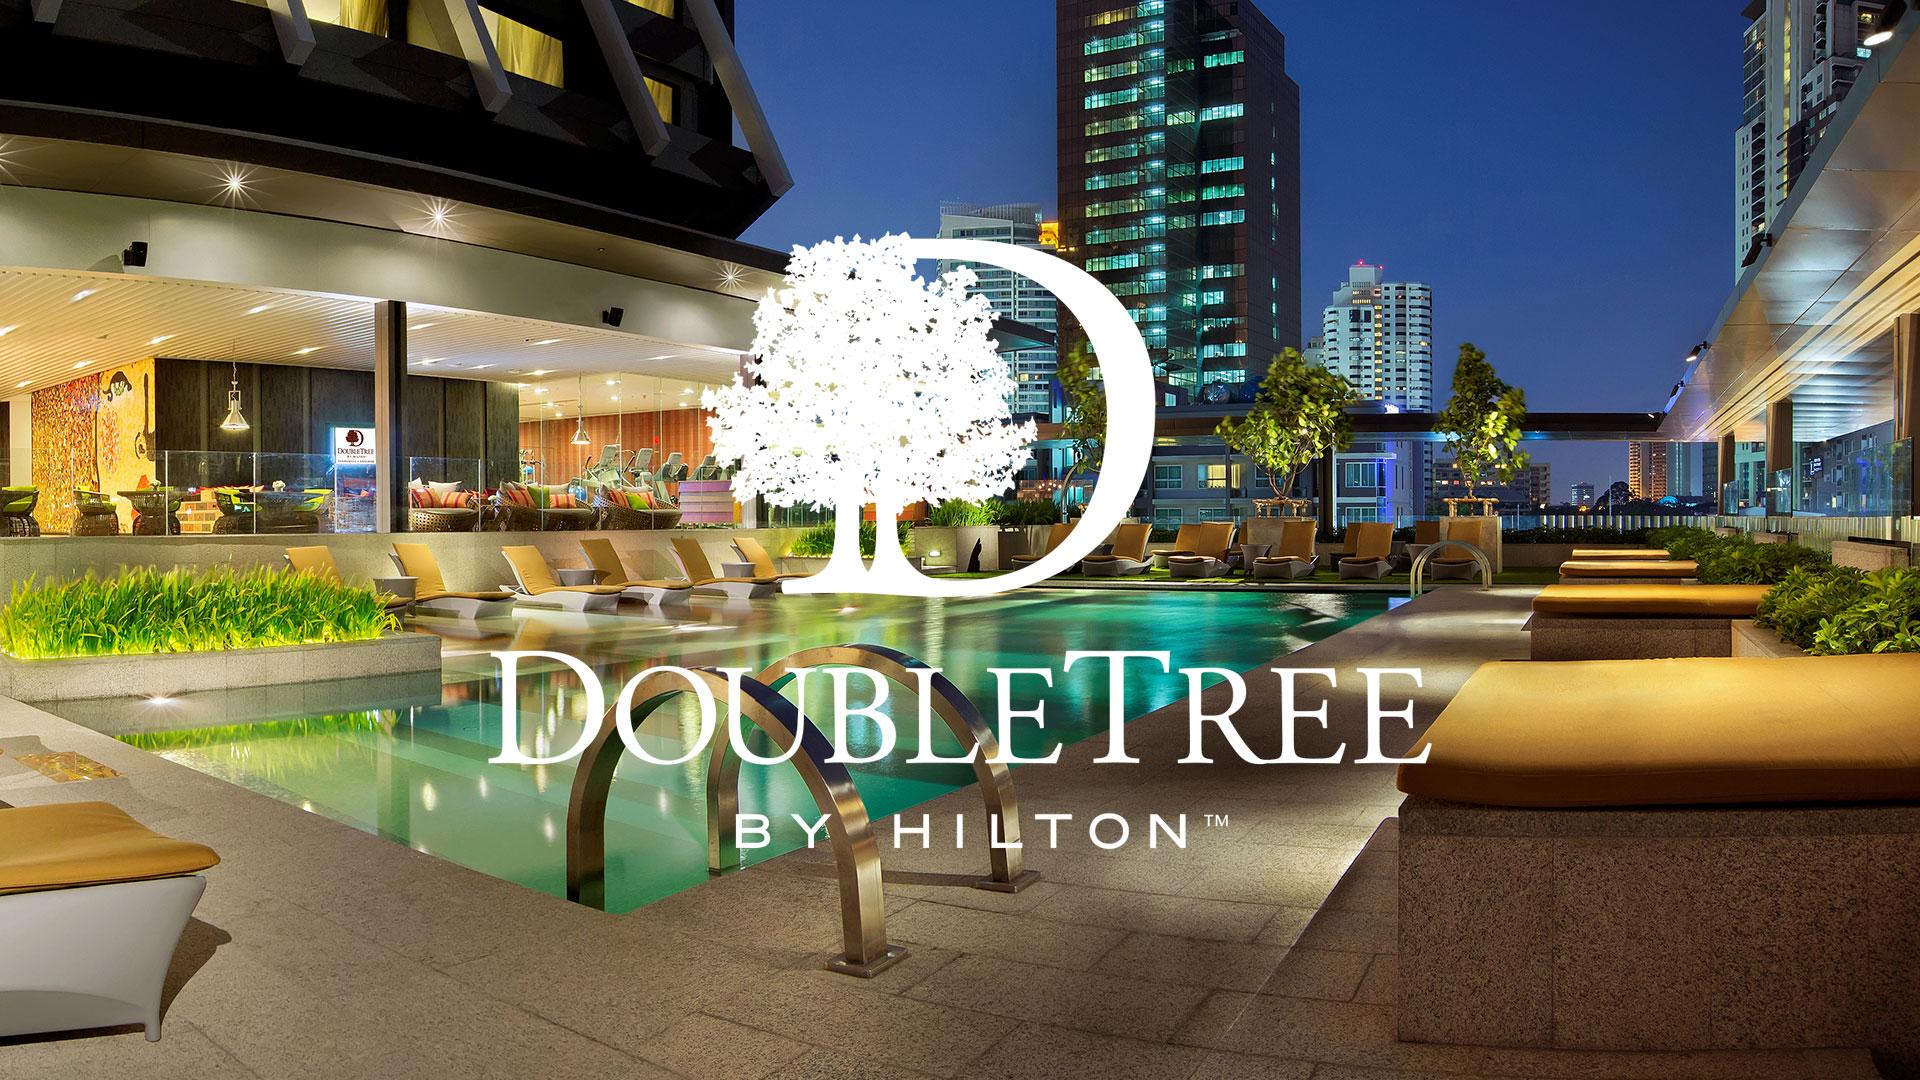 DoubleTree-Hotels-Skylight-Inspection